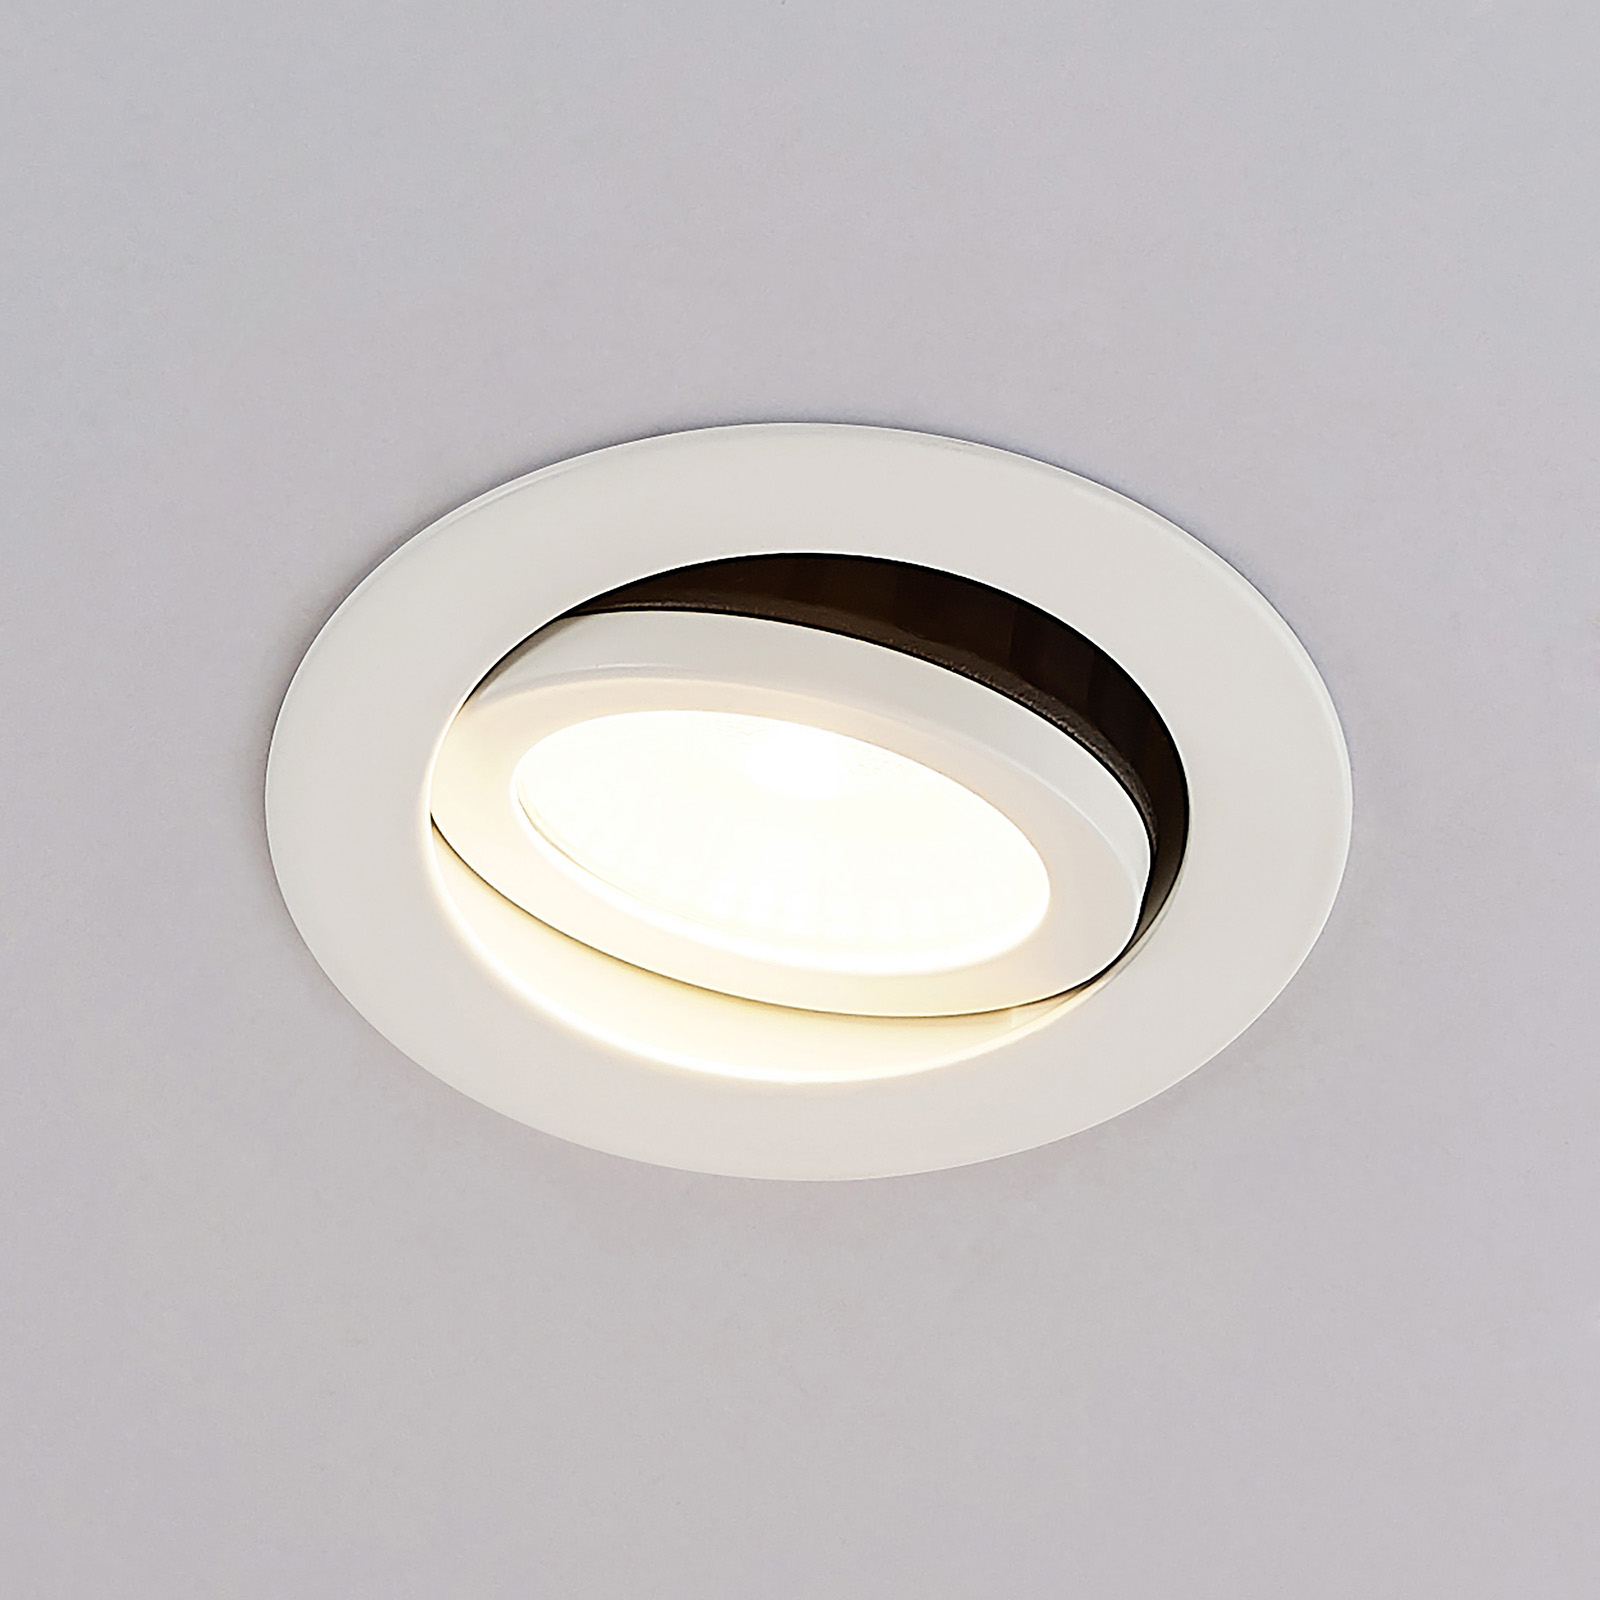 Arcchio Nabor LED-Downlight 36° 2.700K IP65, 8,2W